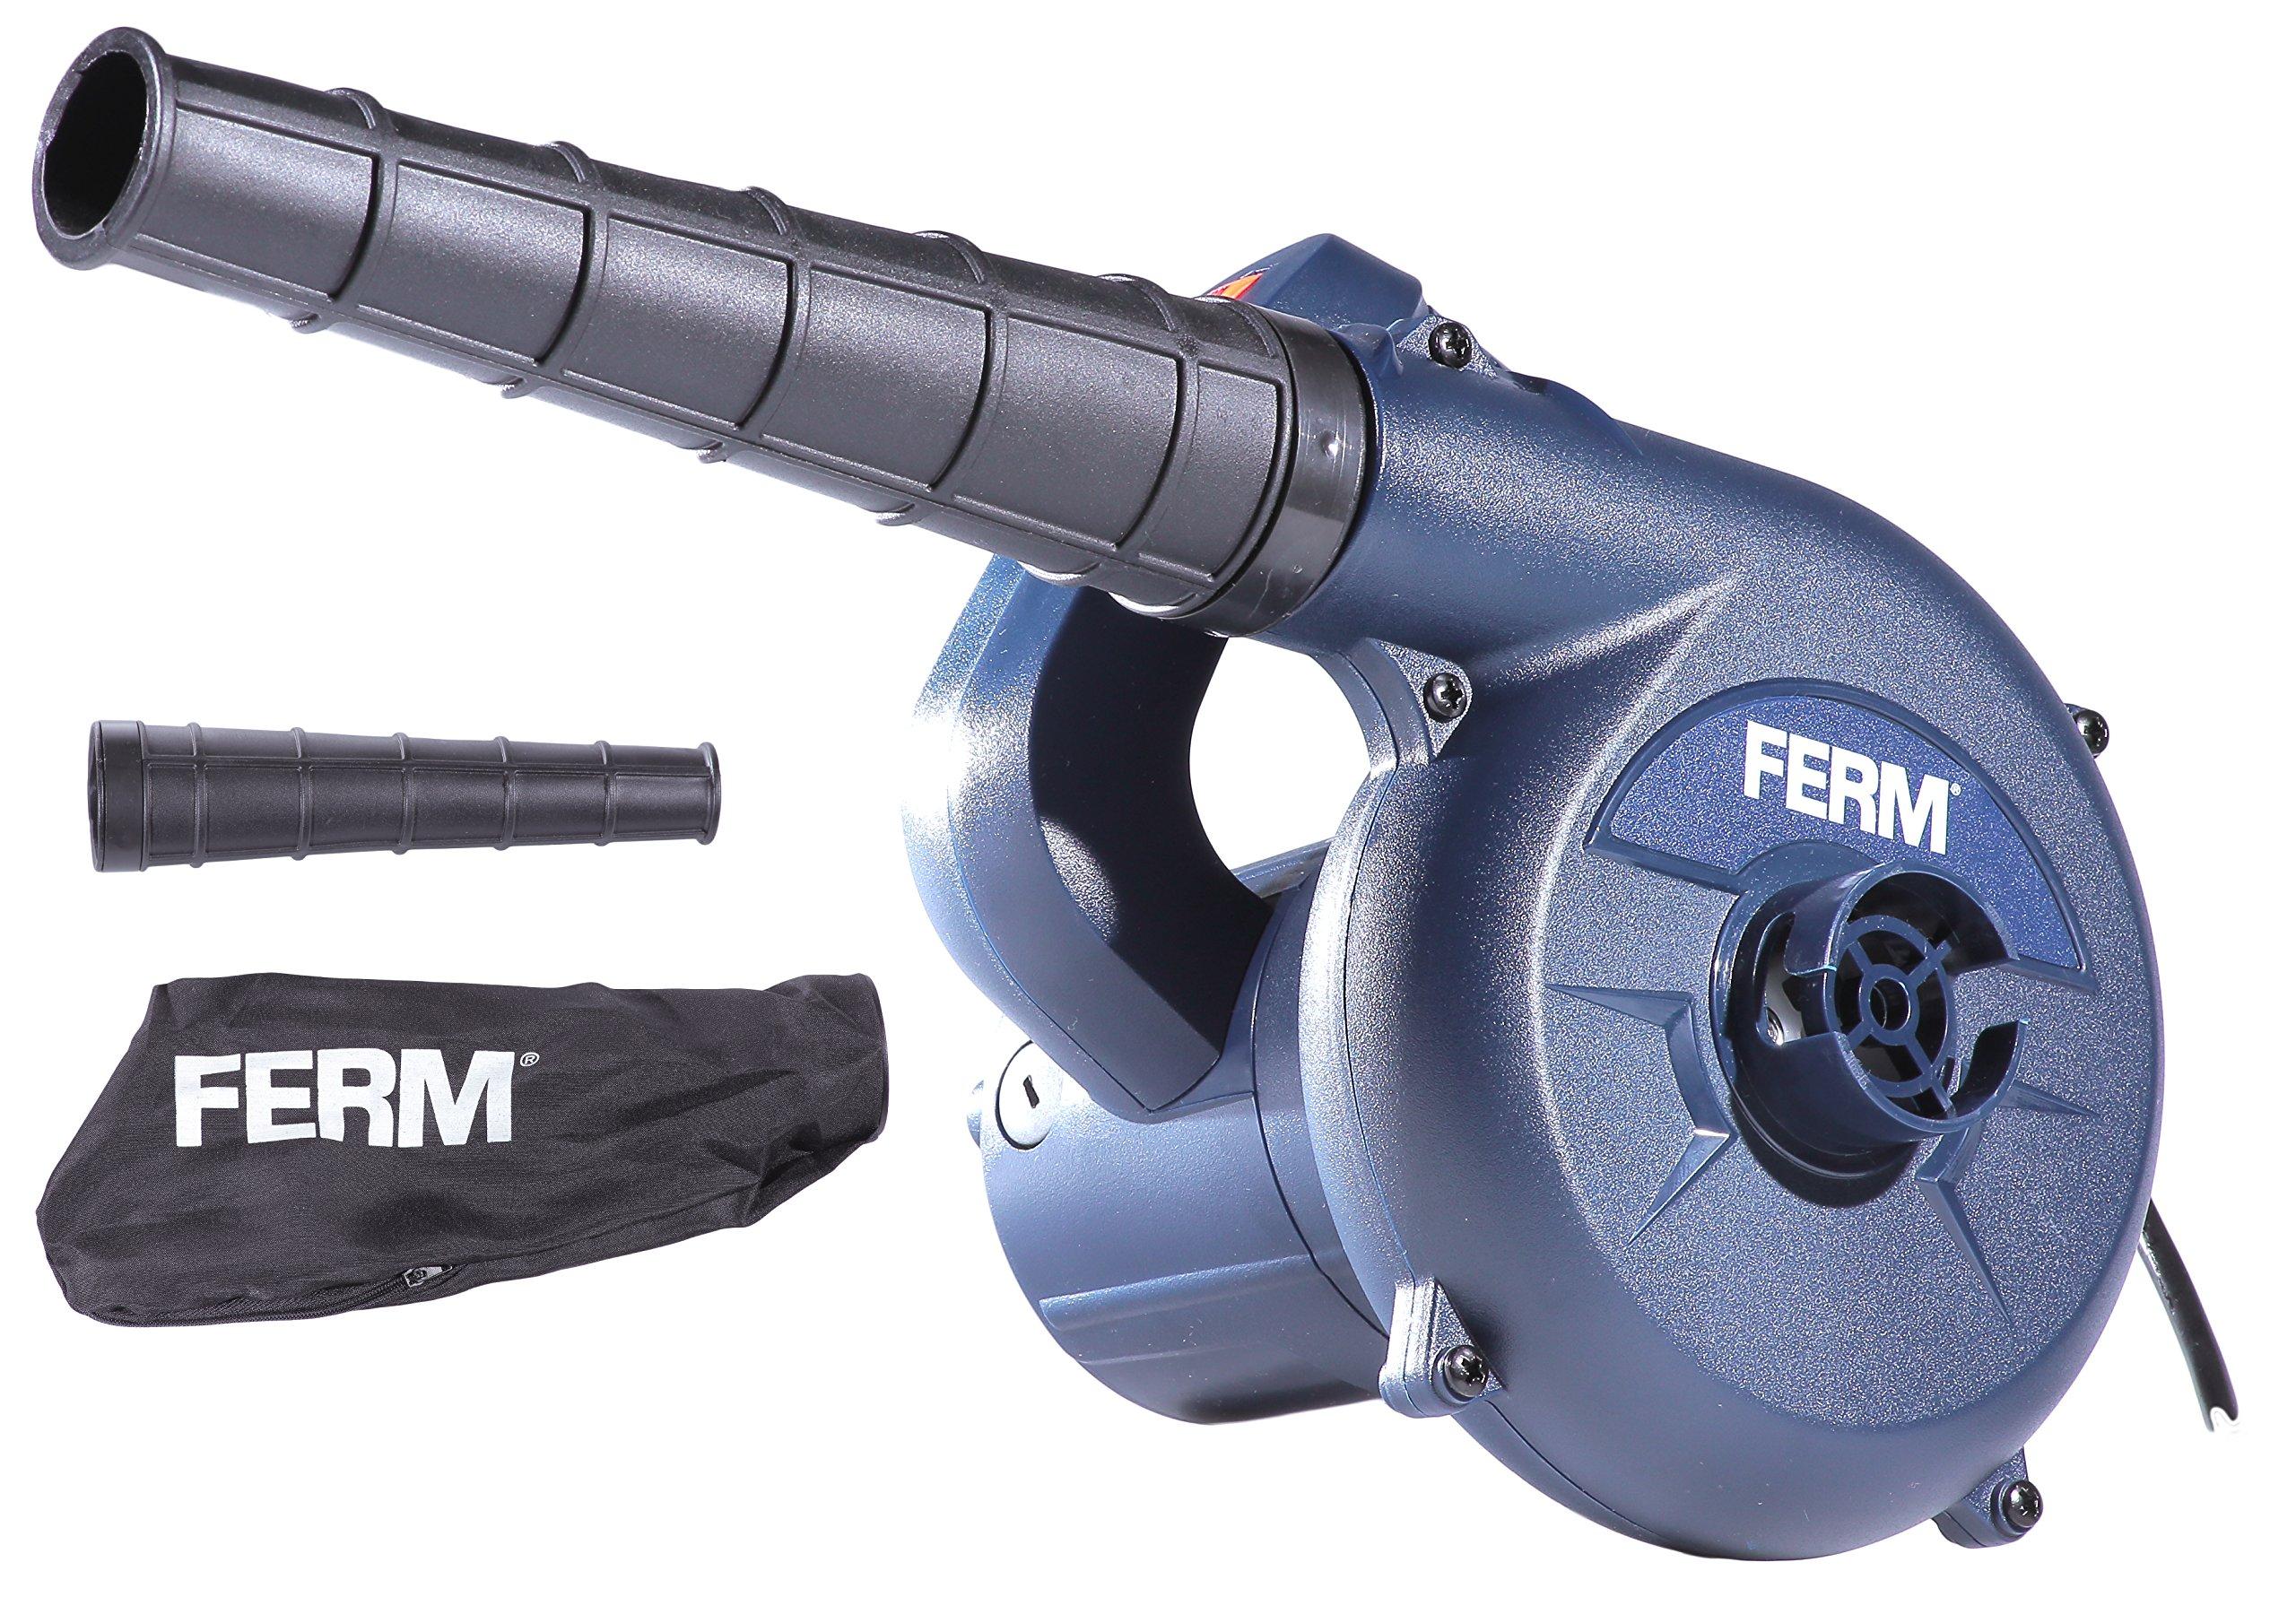 FERM EBM1003